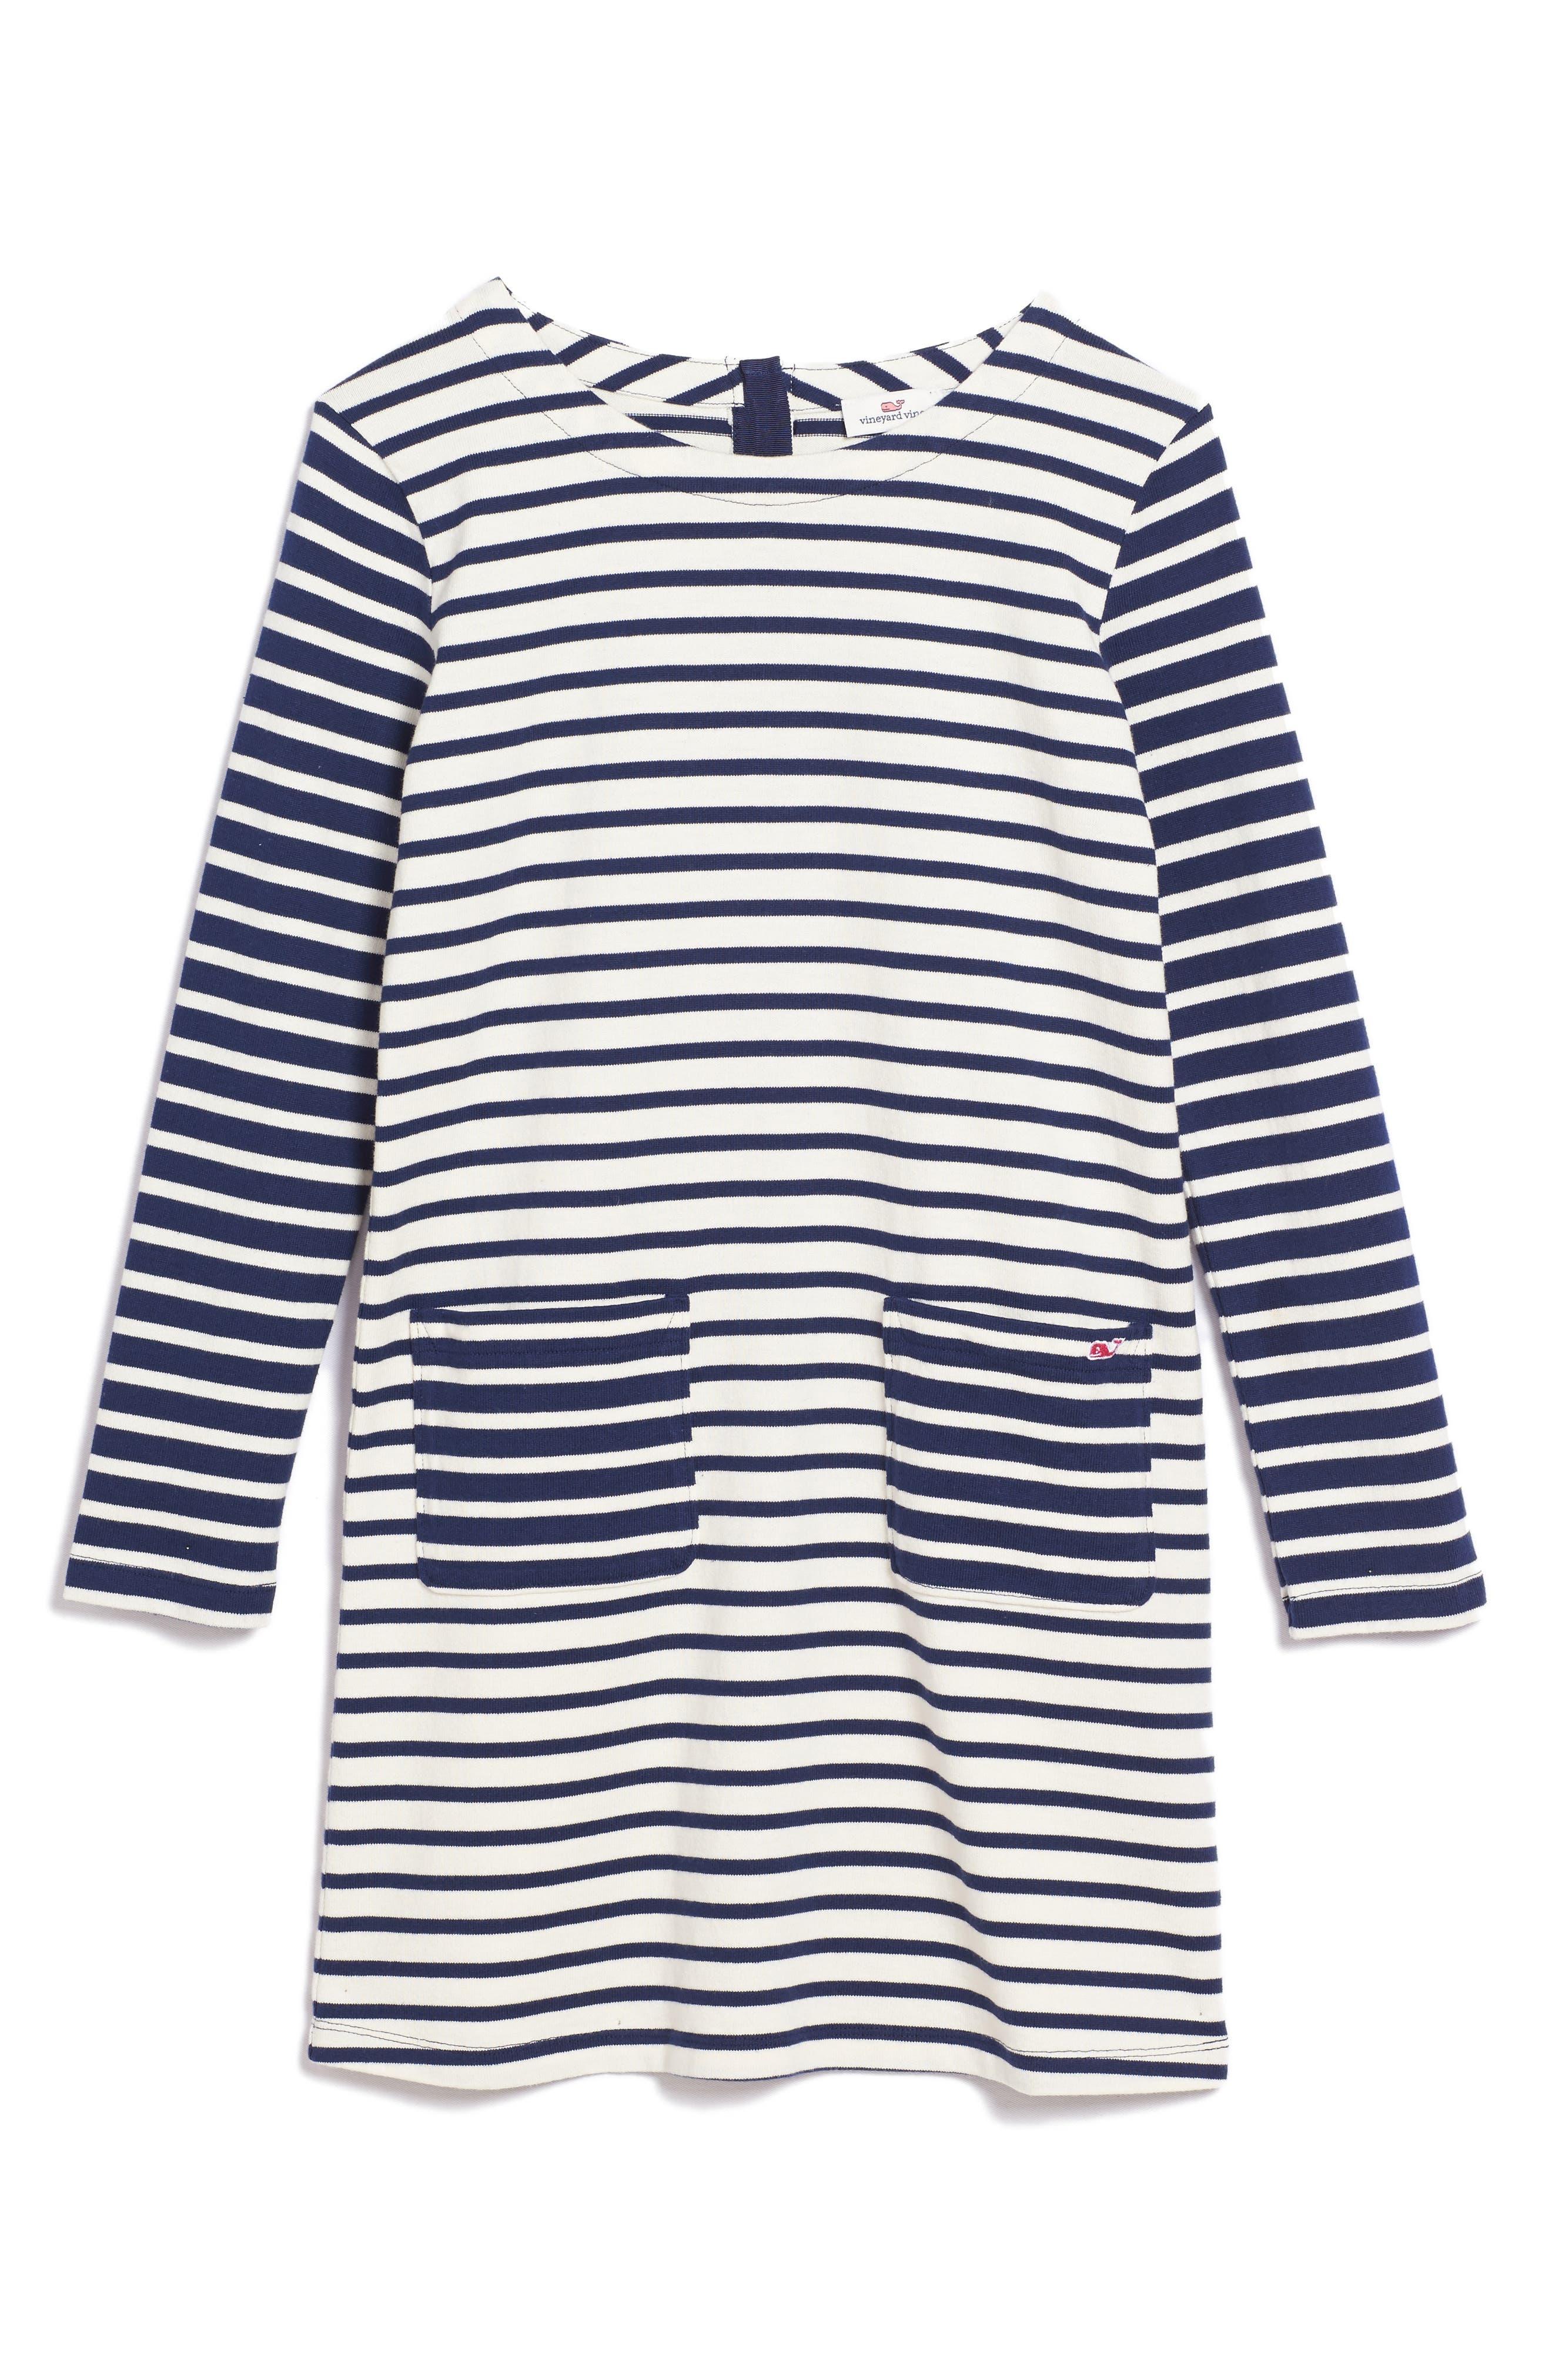 Stripe Knit Dress,                             Main thumbnail 1, color,                             106